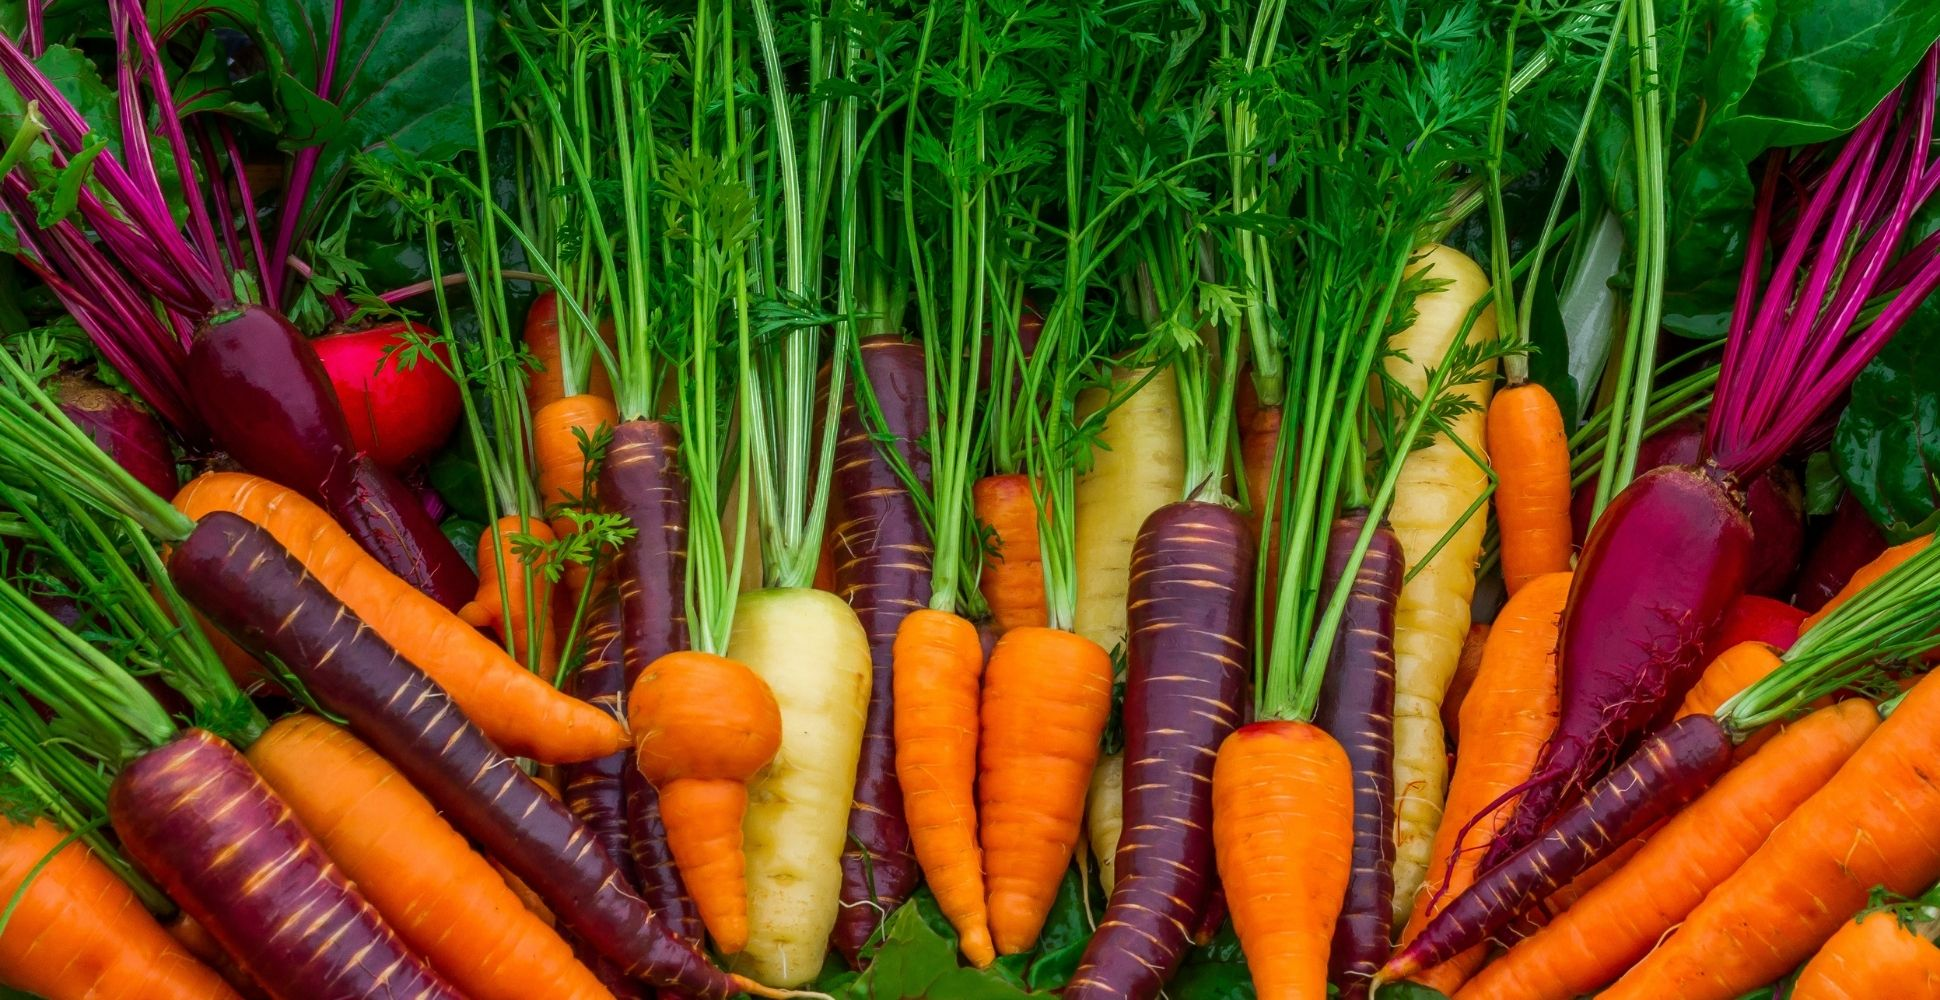 Colourful carrots